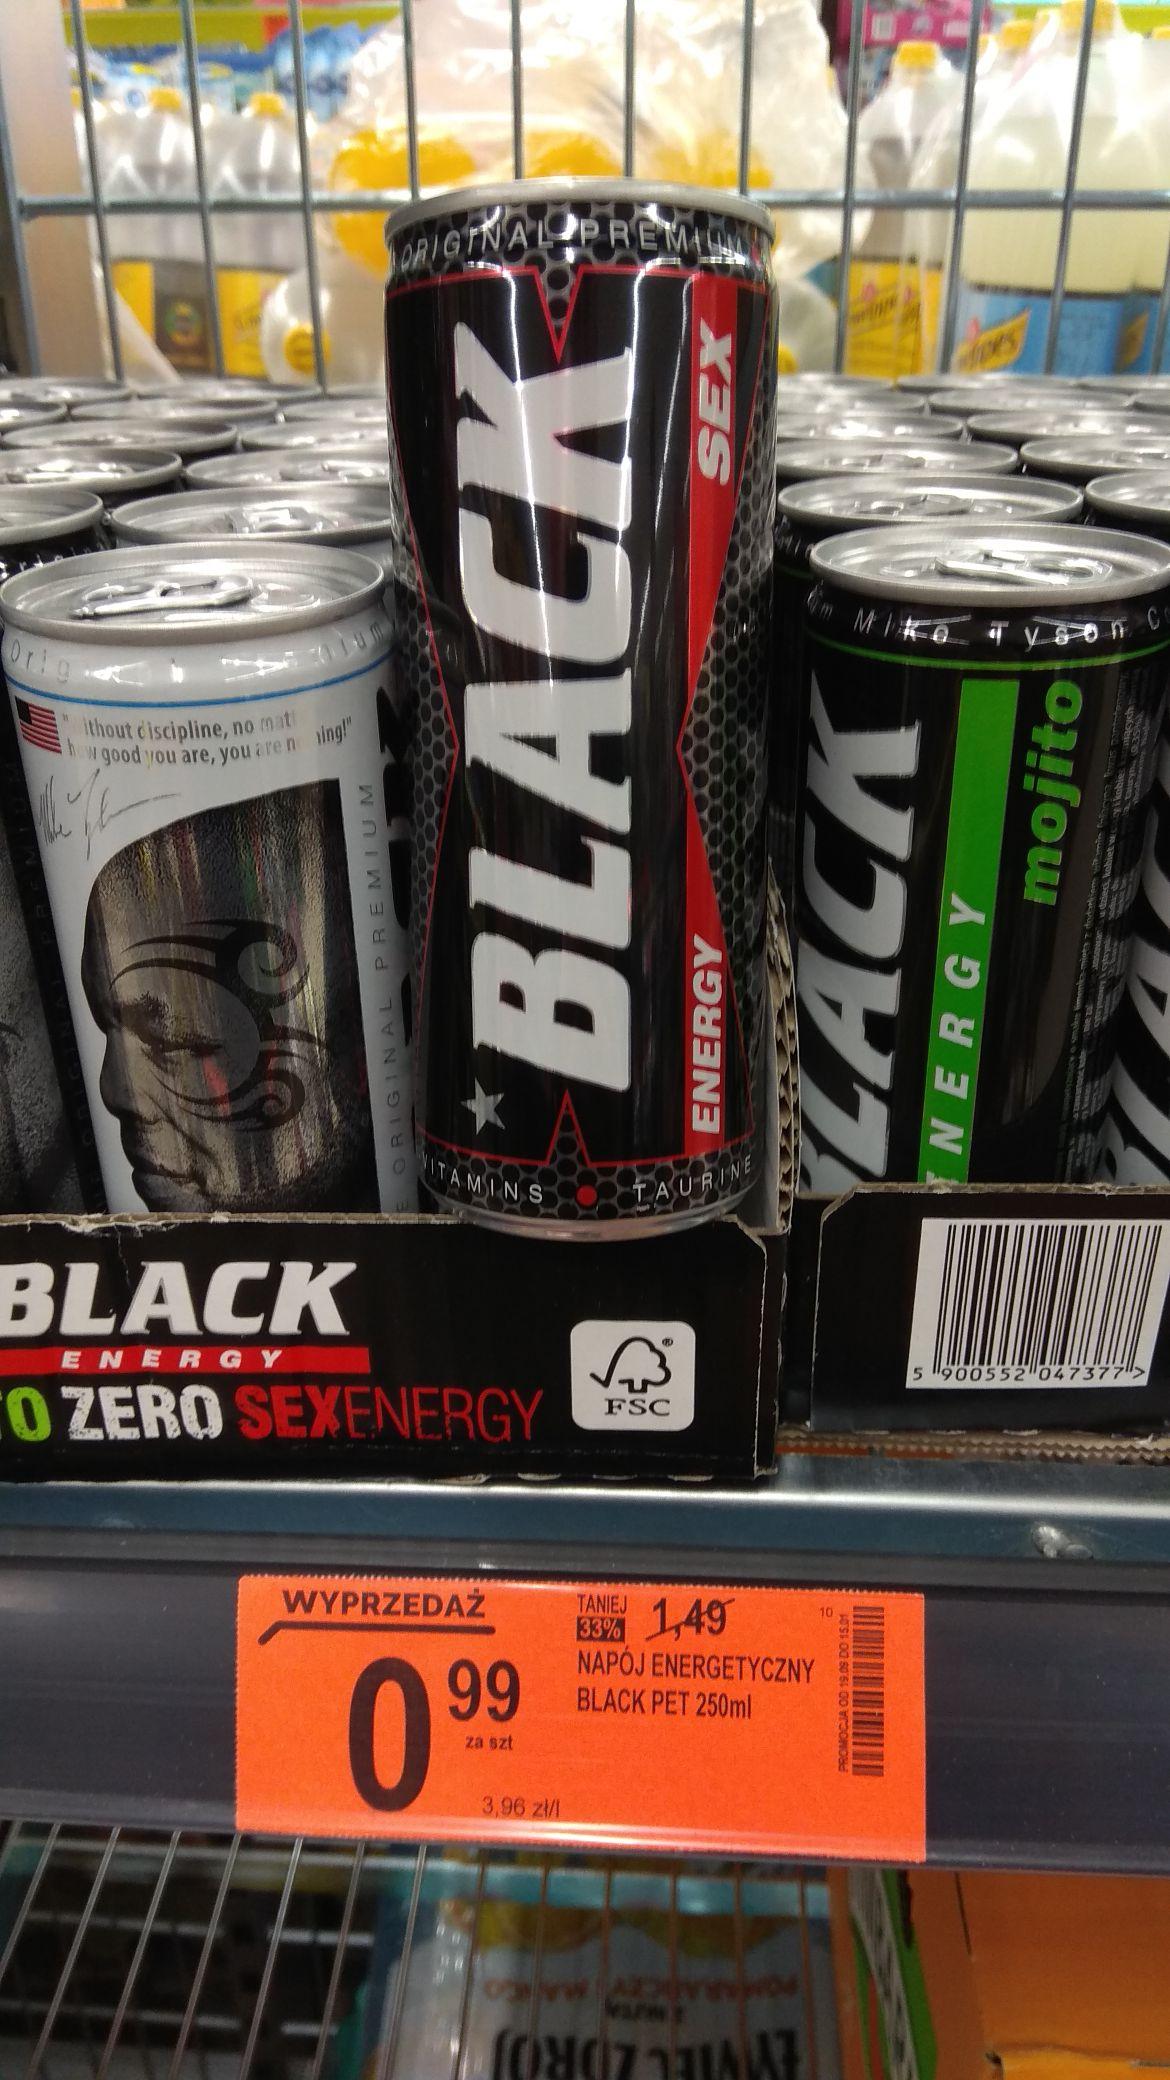 Black Energy Drink Sex, Zero i Mojito po 99gr. w Biedronka.